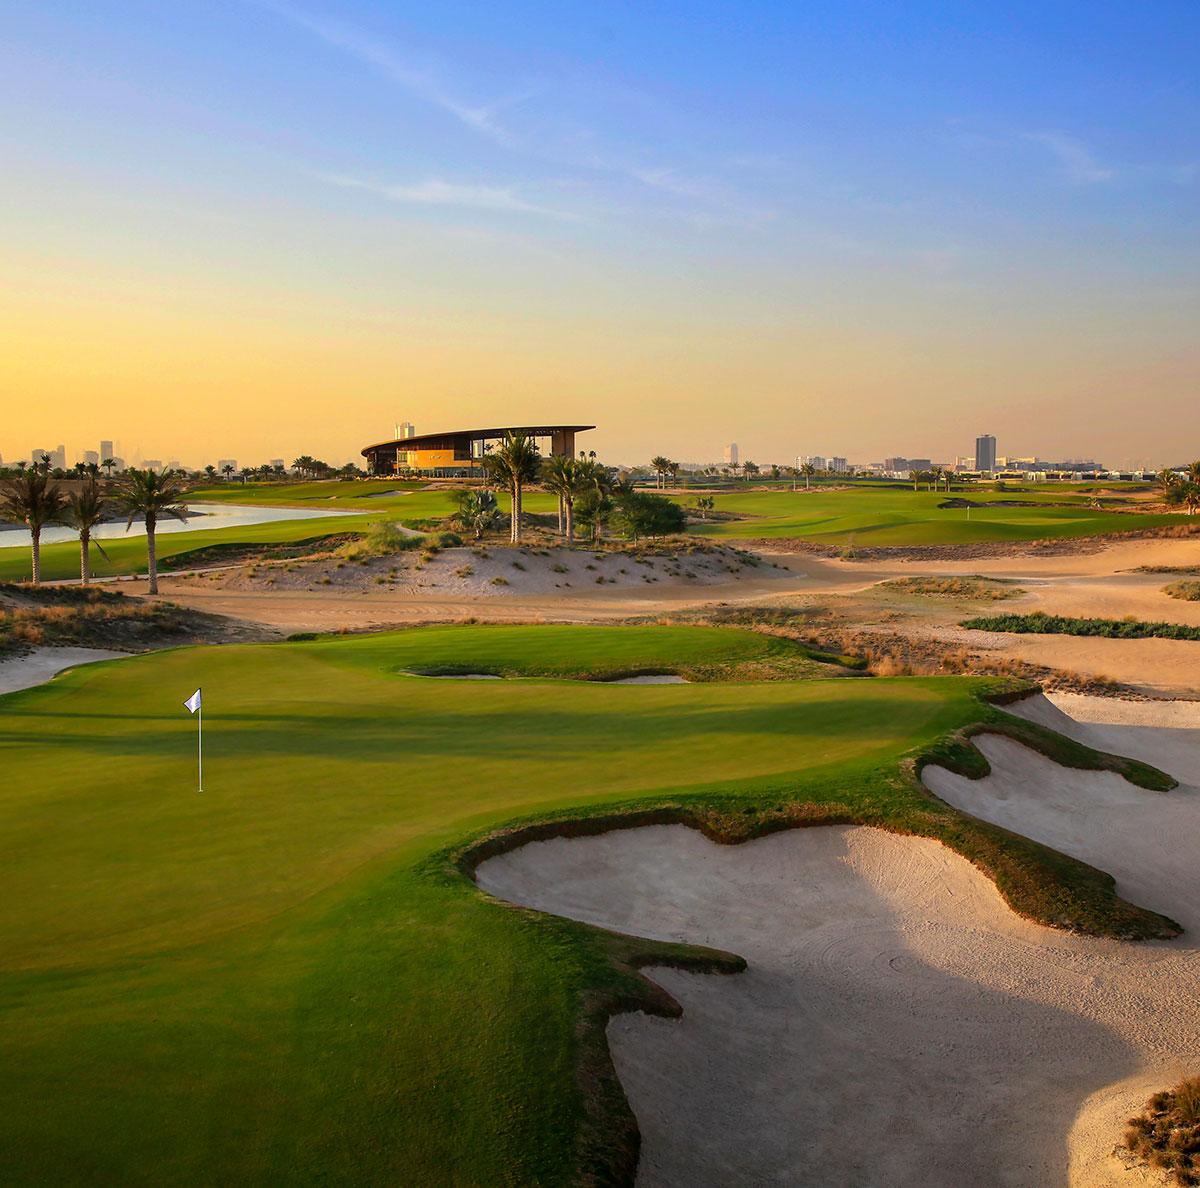 Golfbana i Dubai